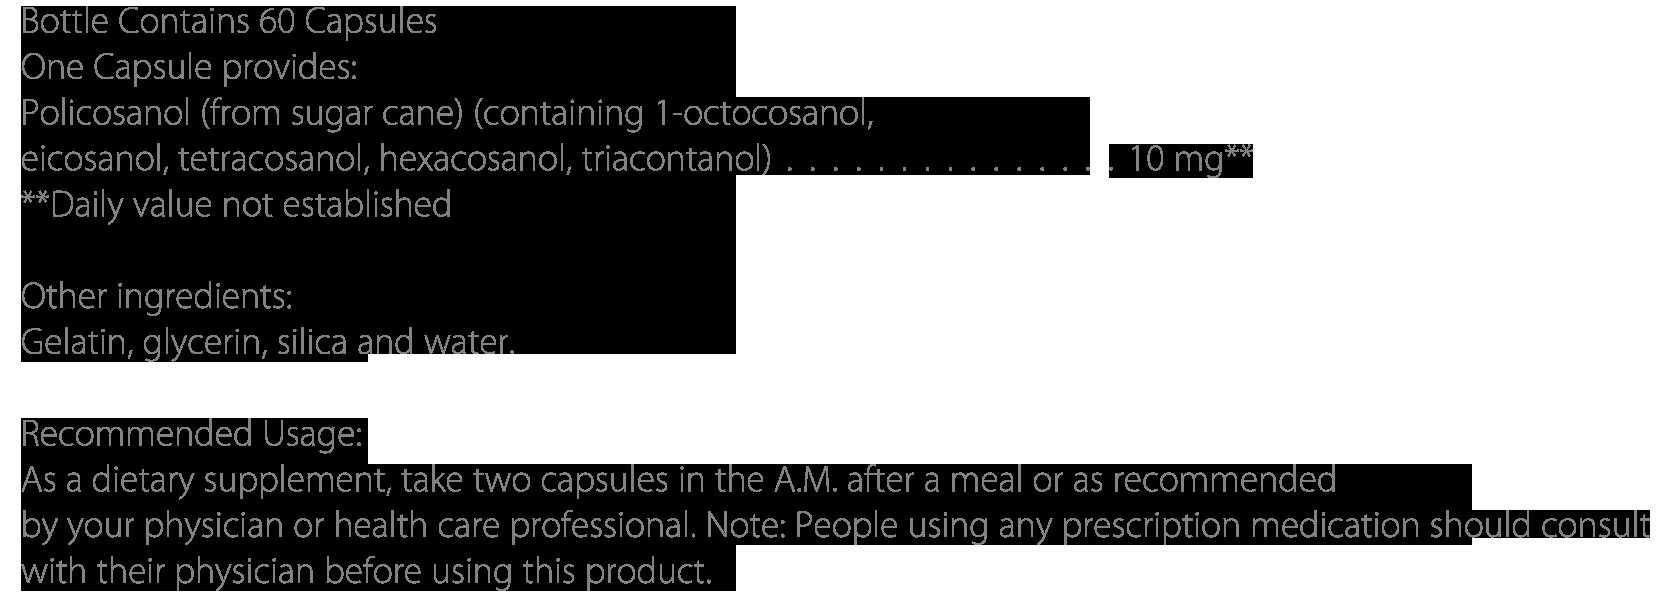 Policosanol